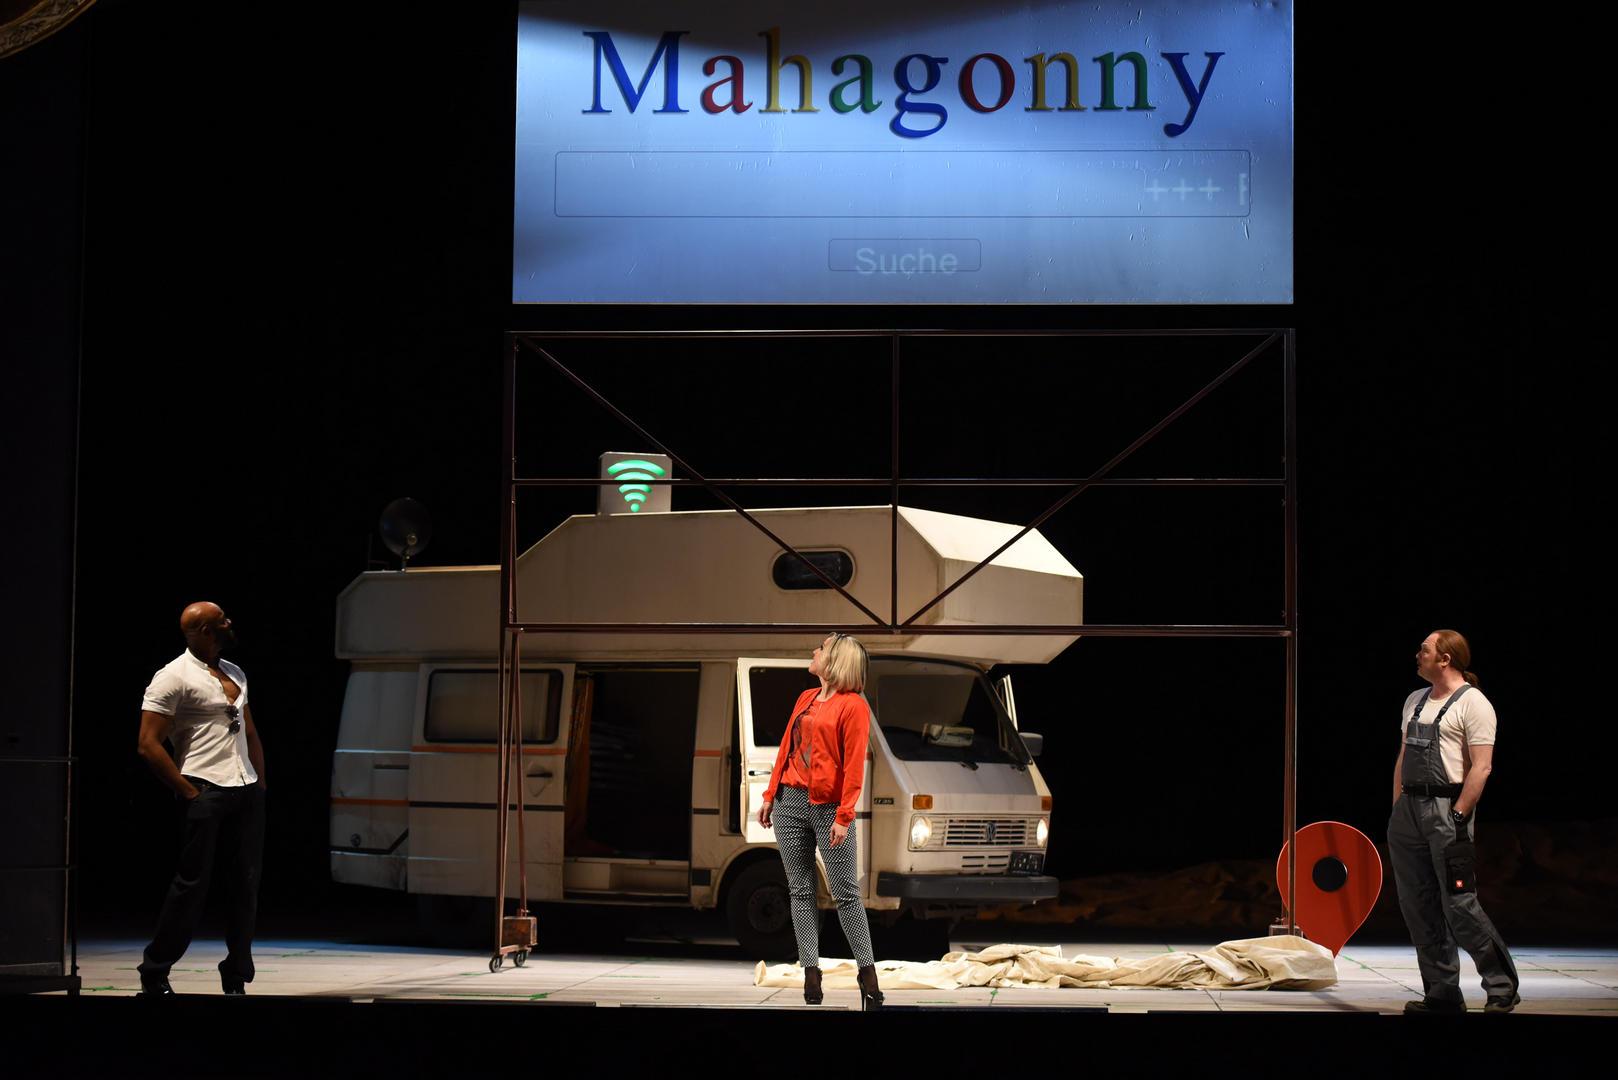 Mahagonny-Opera-by-Kurt-Weill-Stage-director-Jacopo-Spirei-Salzburg-3